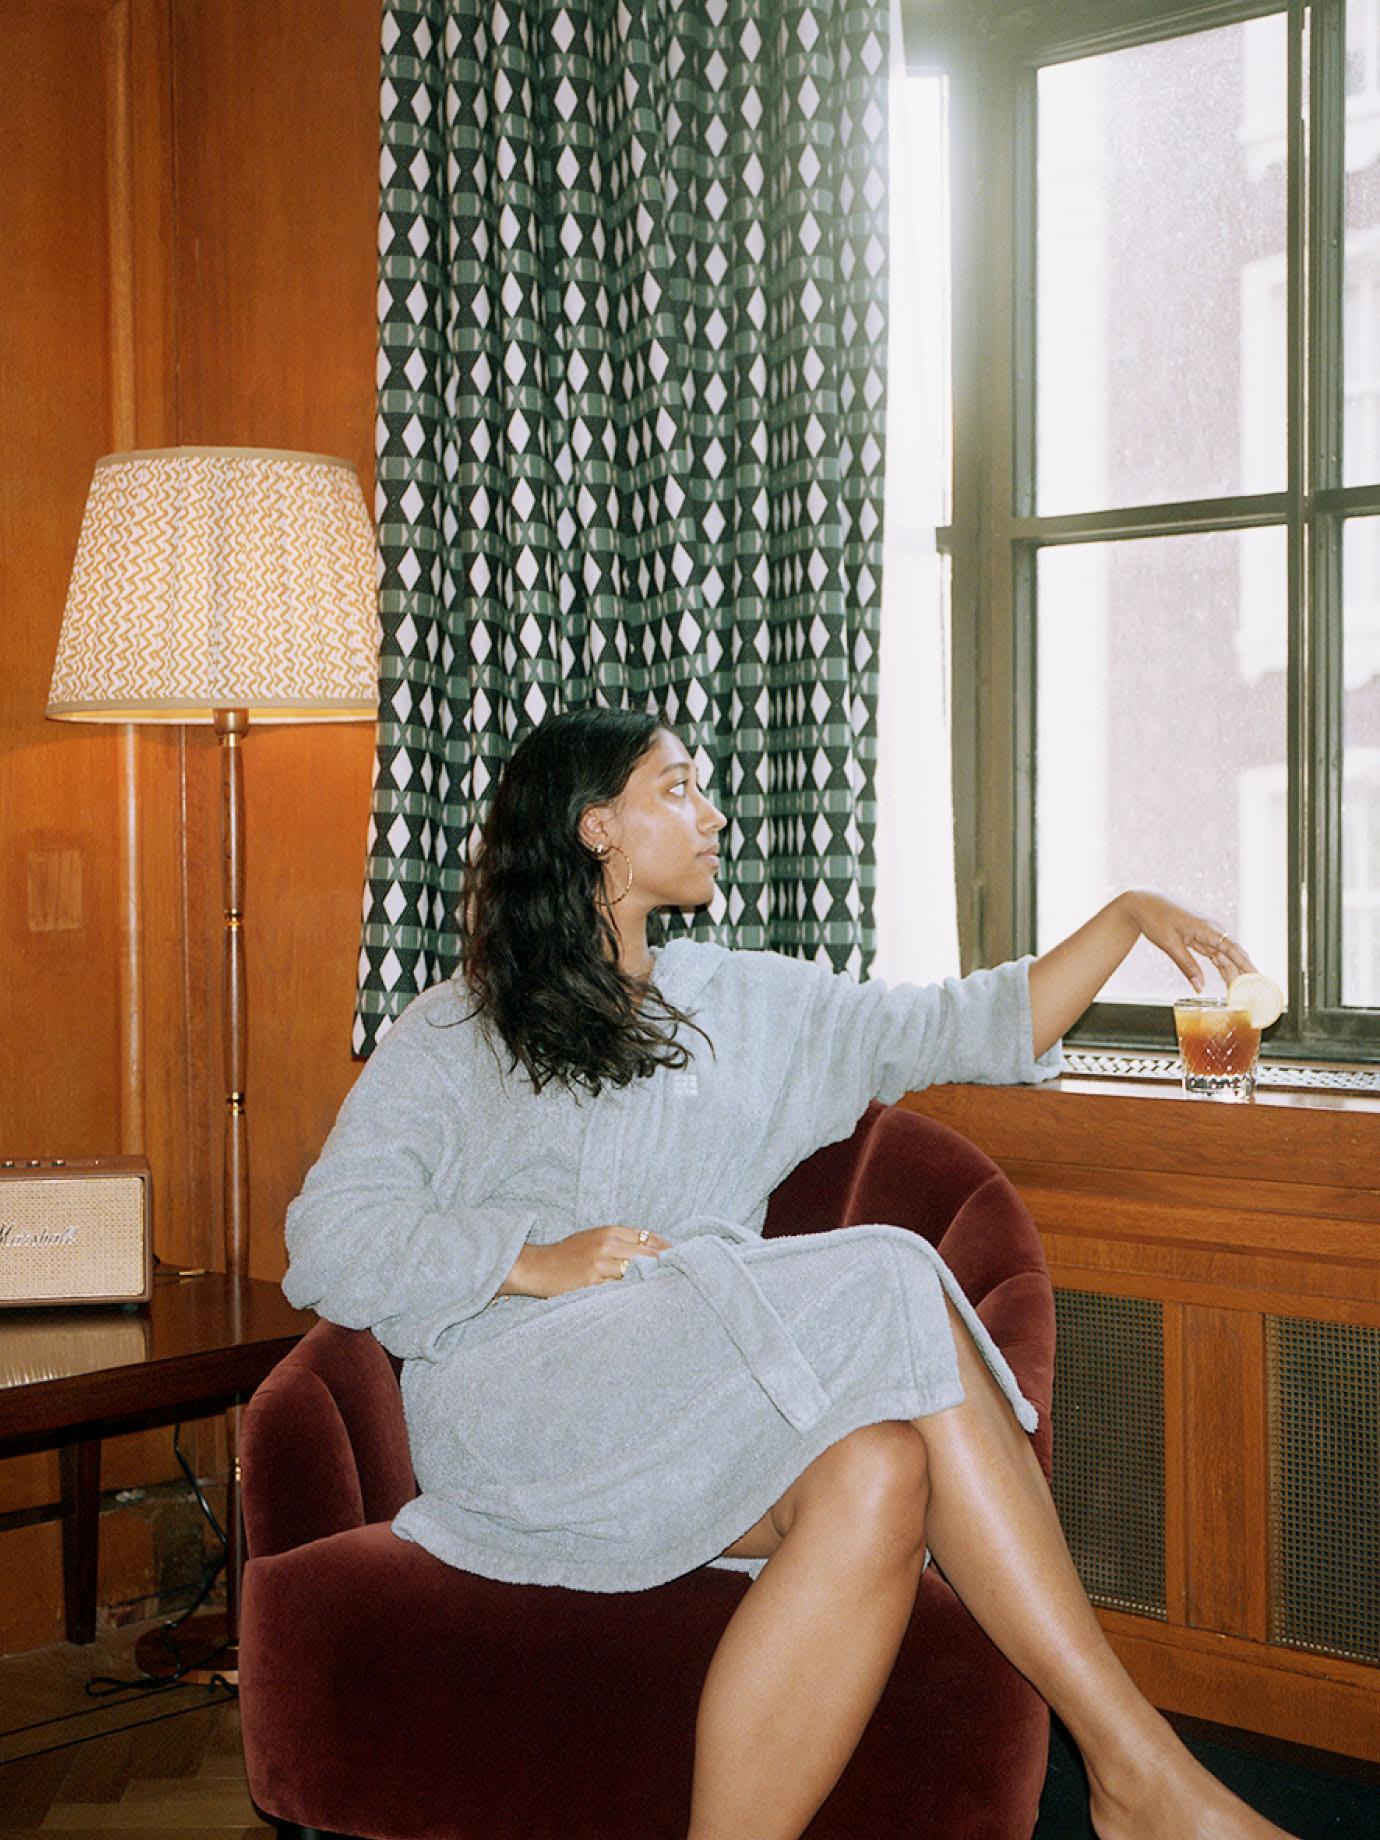 A woman sitting in a chair in a bathrobe.